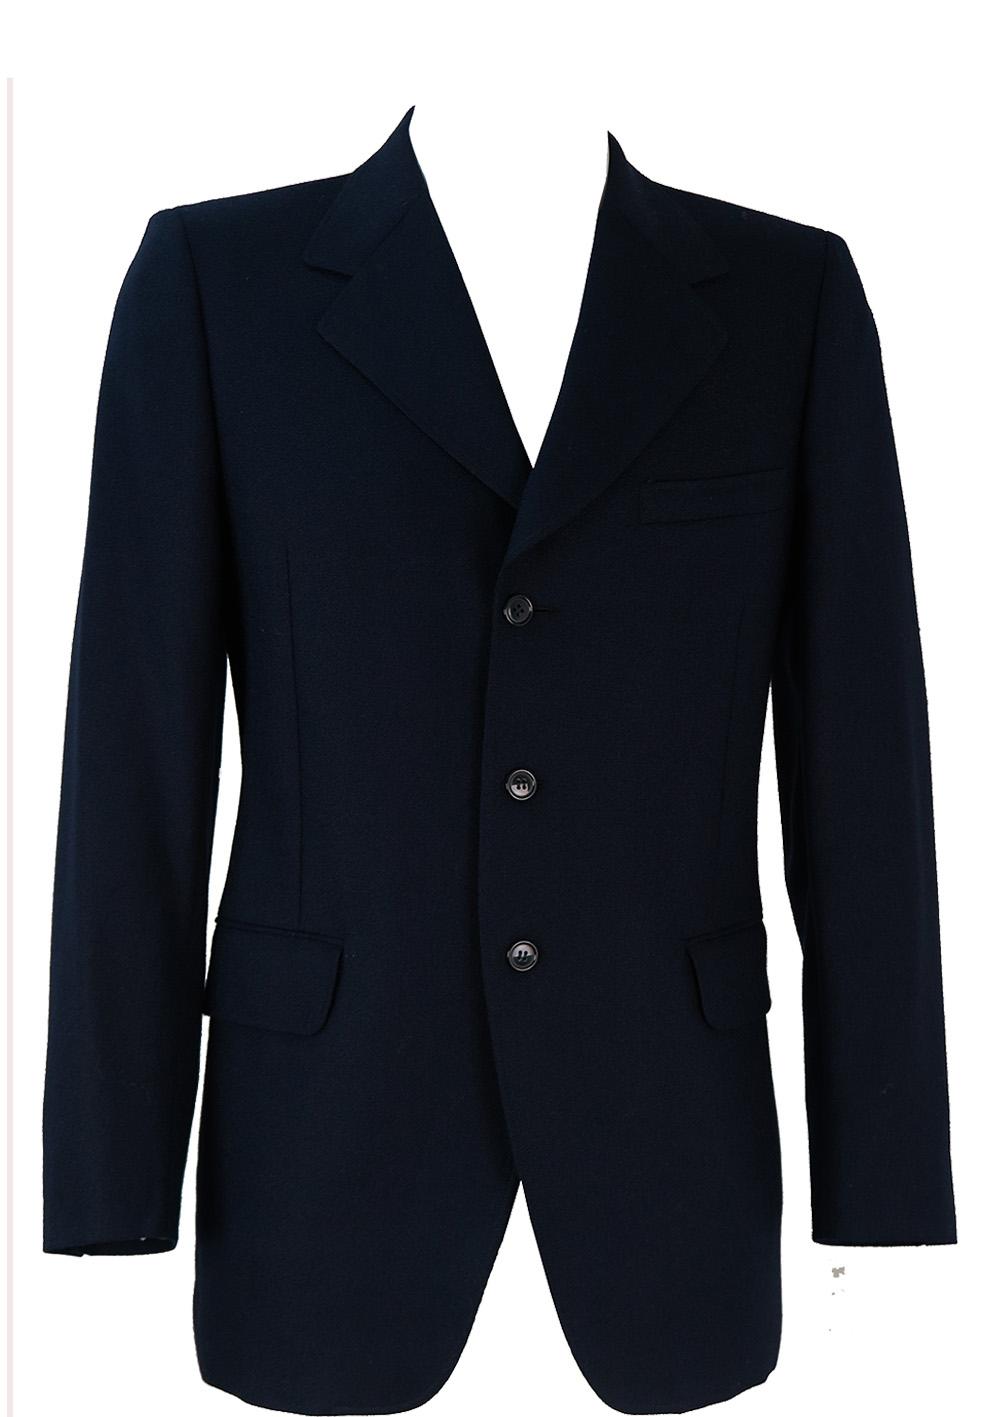 28f8ba1e3 Pure New Wool Navy Blazer Jacket - M